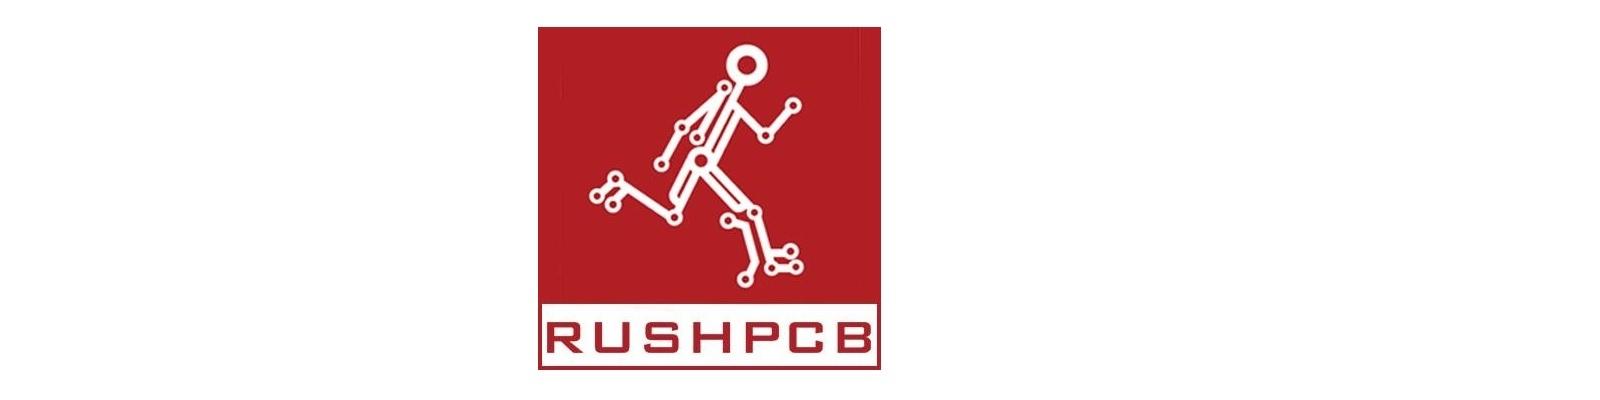 RUSH PCB (@rushpcb) Cover Image